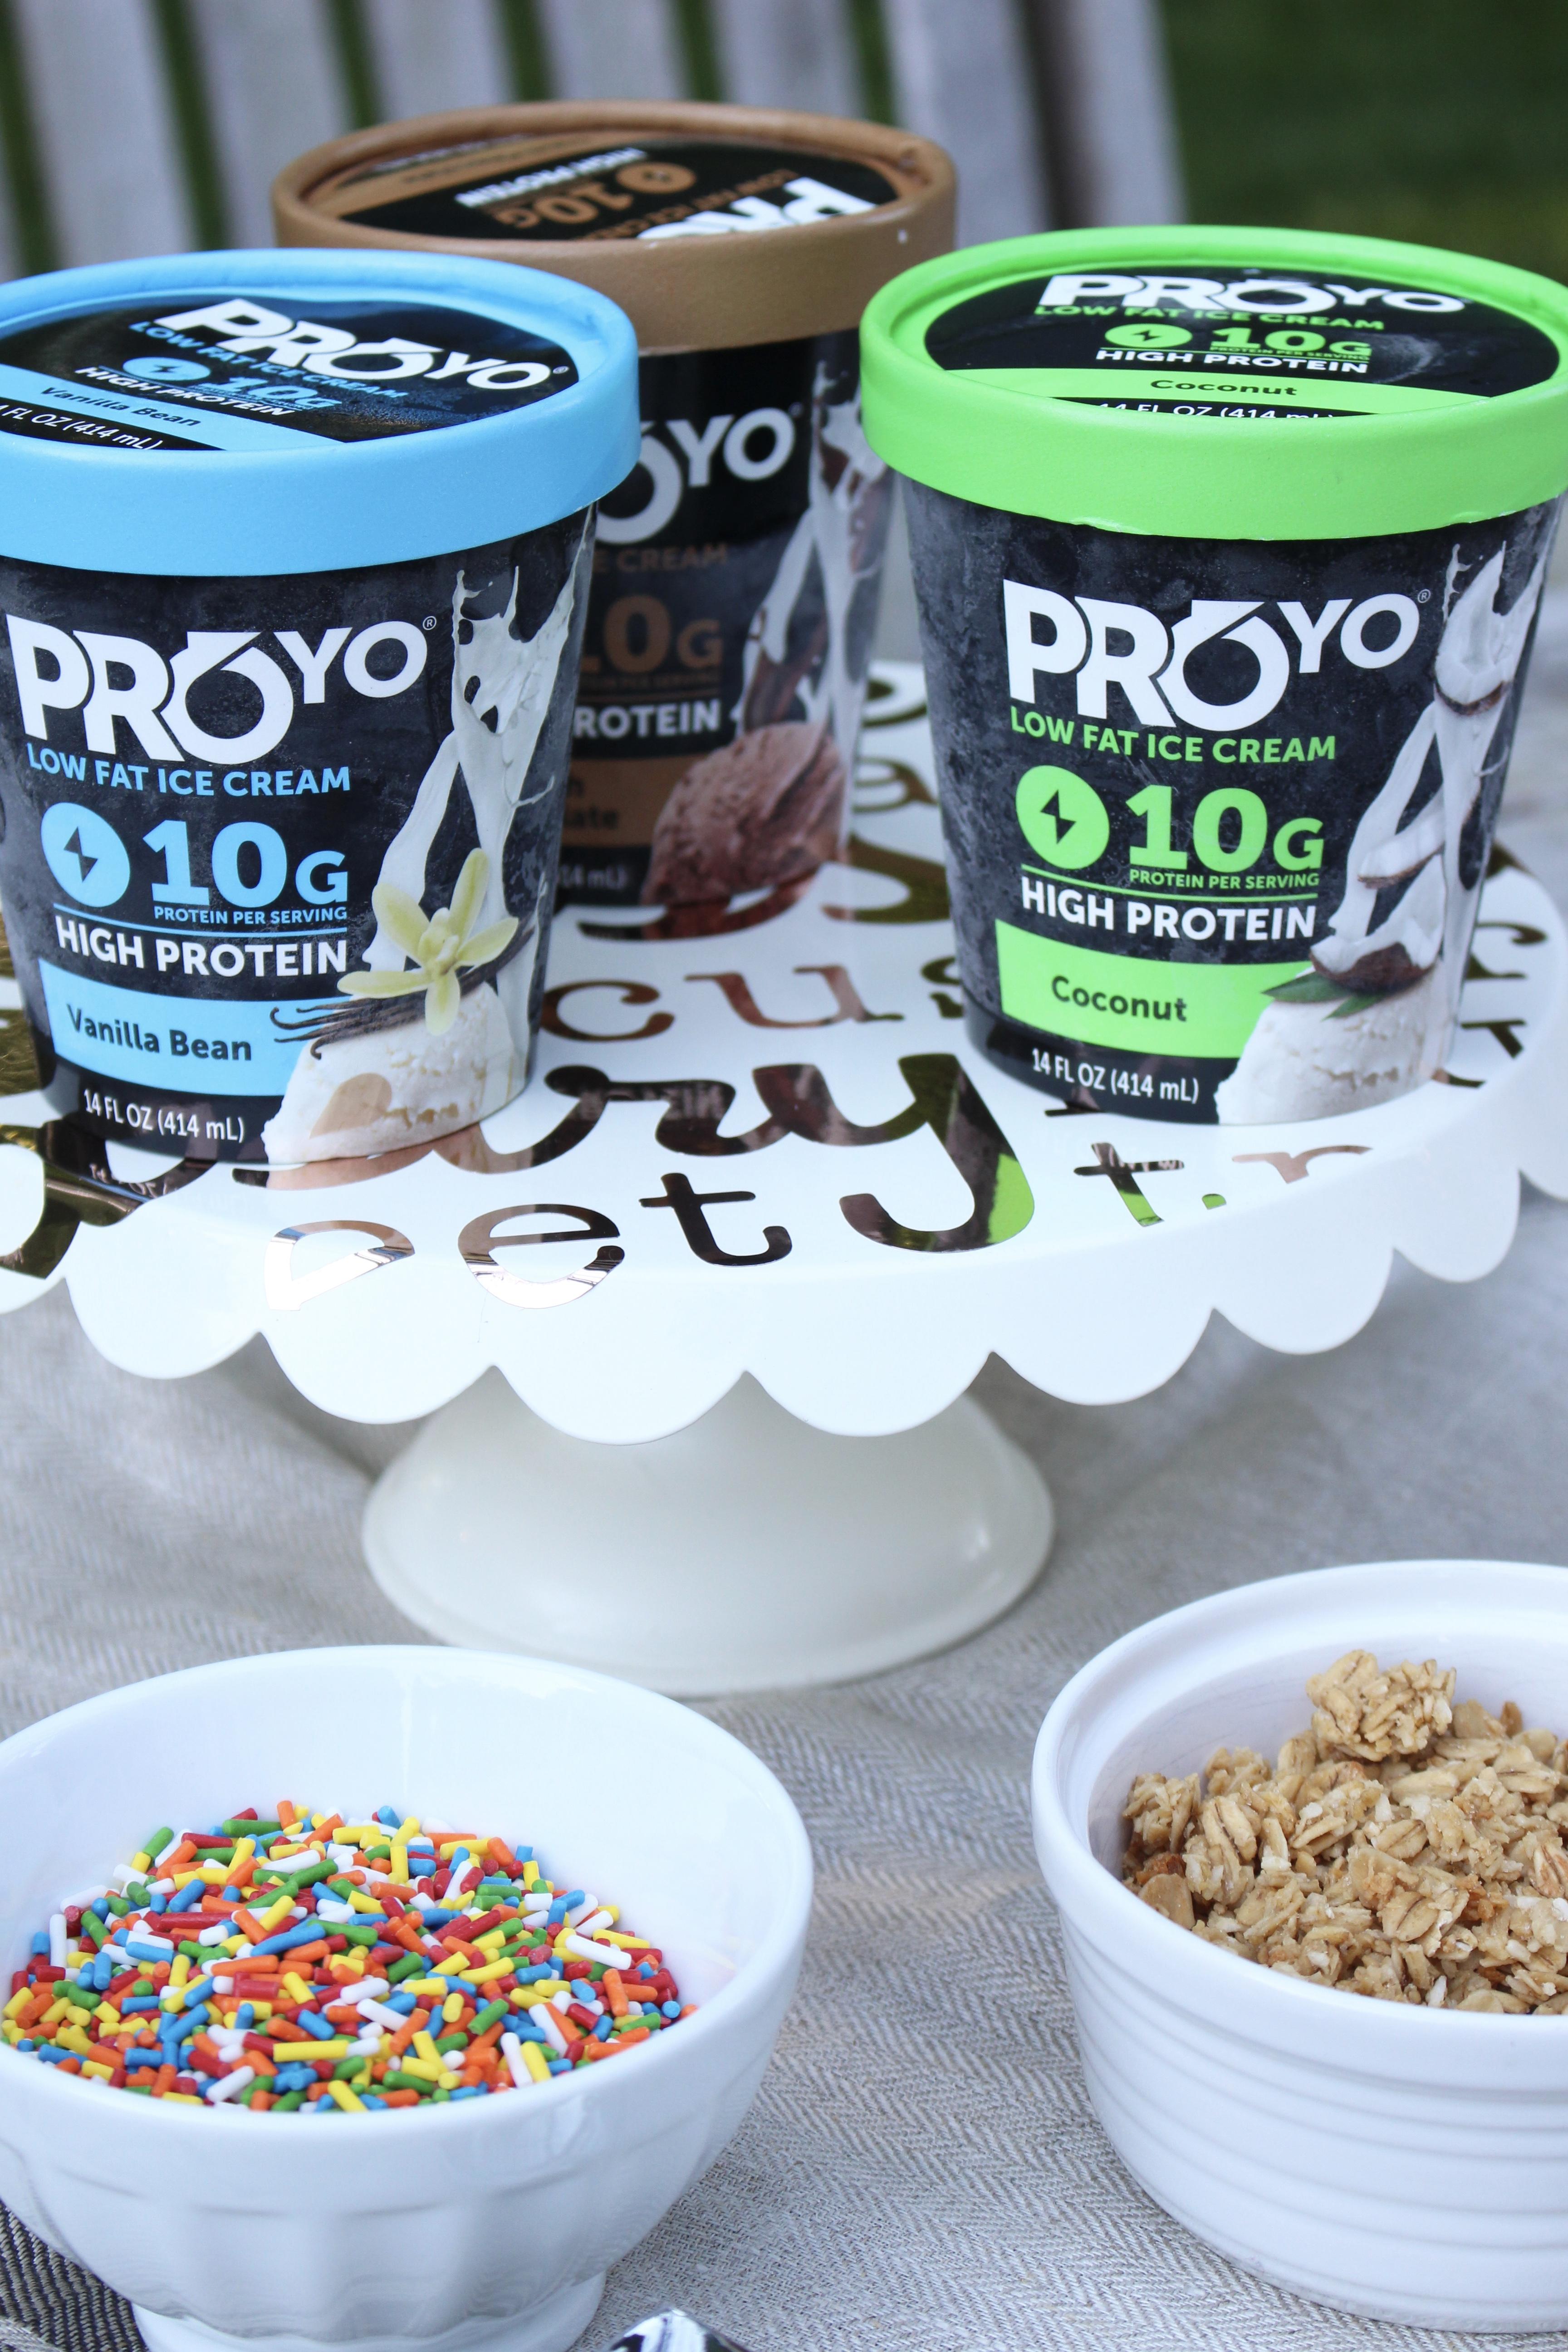 ProYo Ice Cream, Party Planning, Summer, Ice Cream, Ice Cream Cone Wraps, DIY Cone Wraps, Food, Desserts, Healthy Treat, Printables